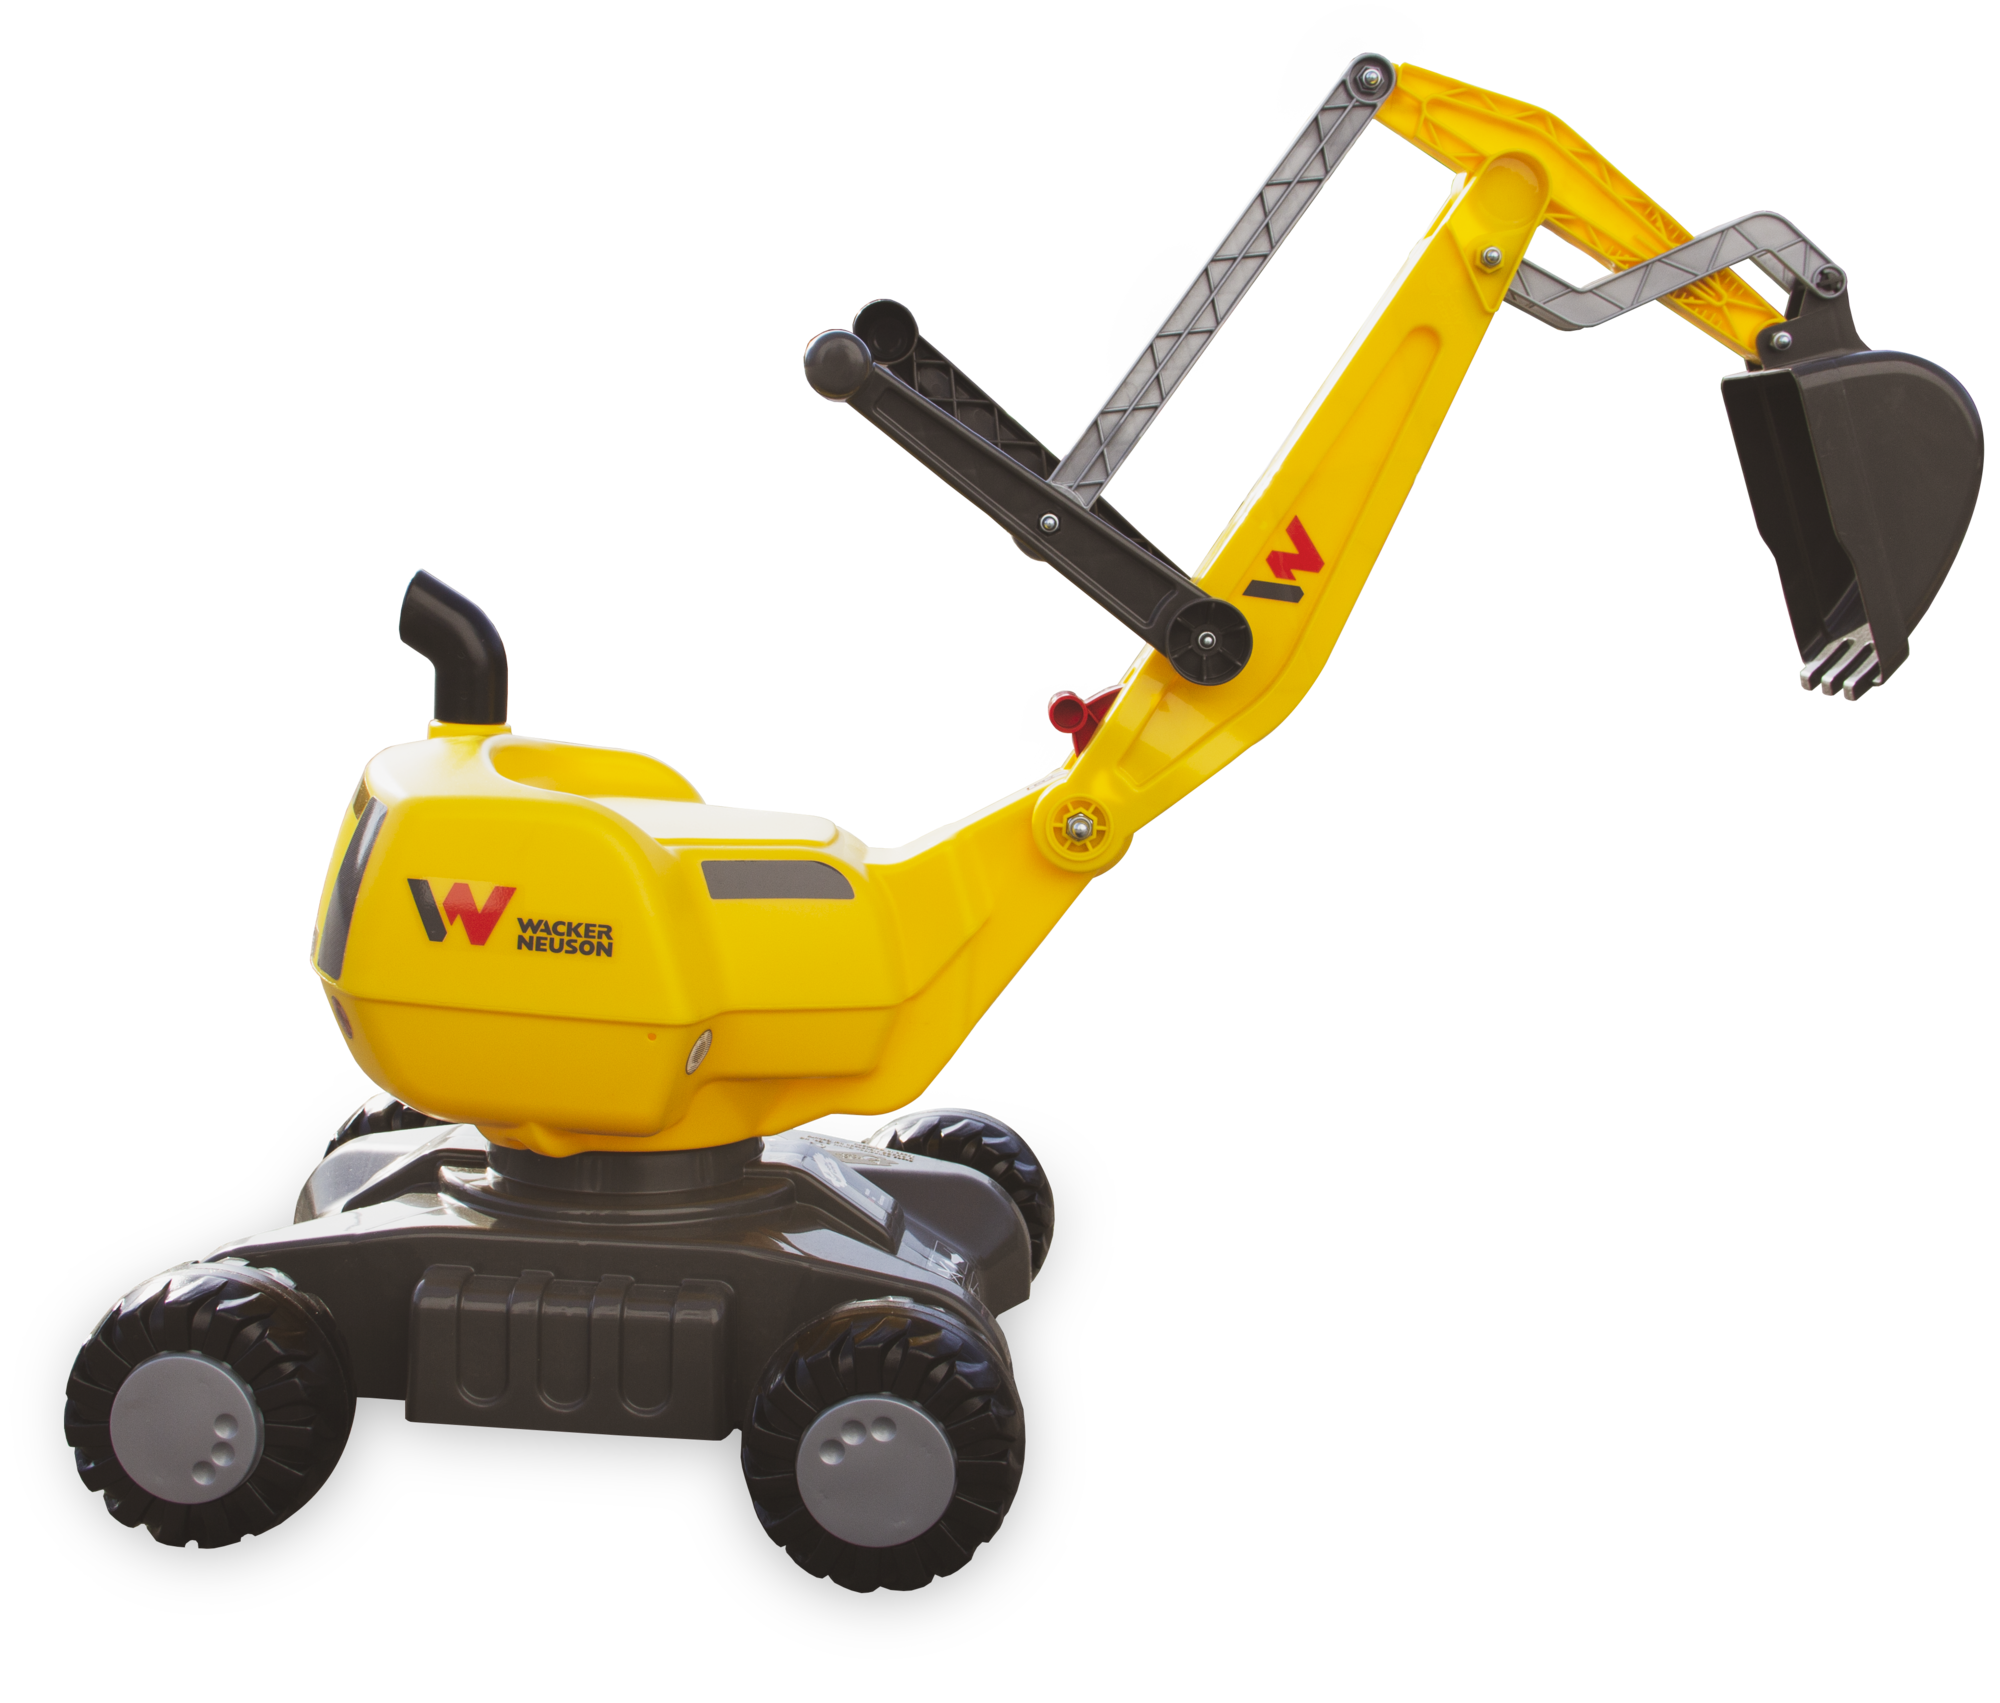 Rolly digger Wacker Neuson